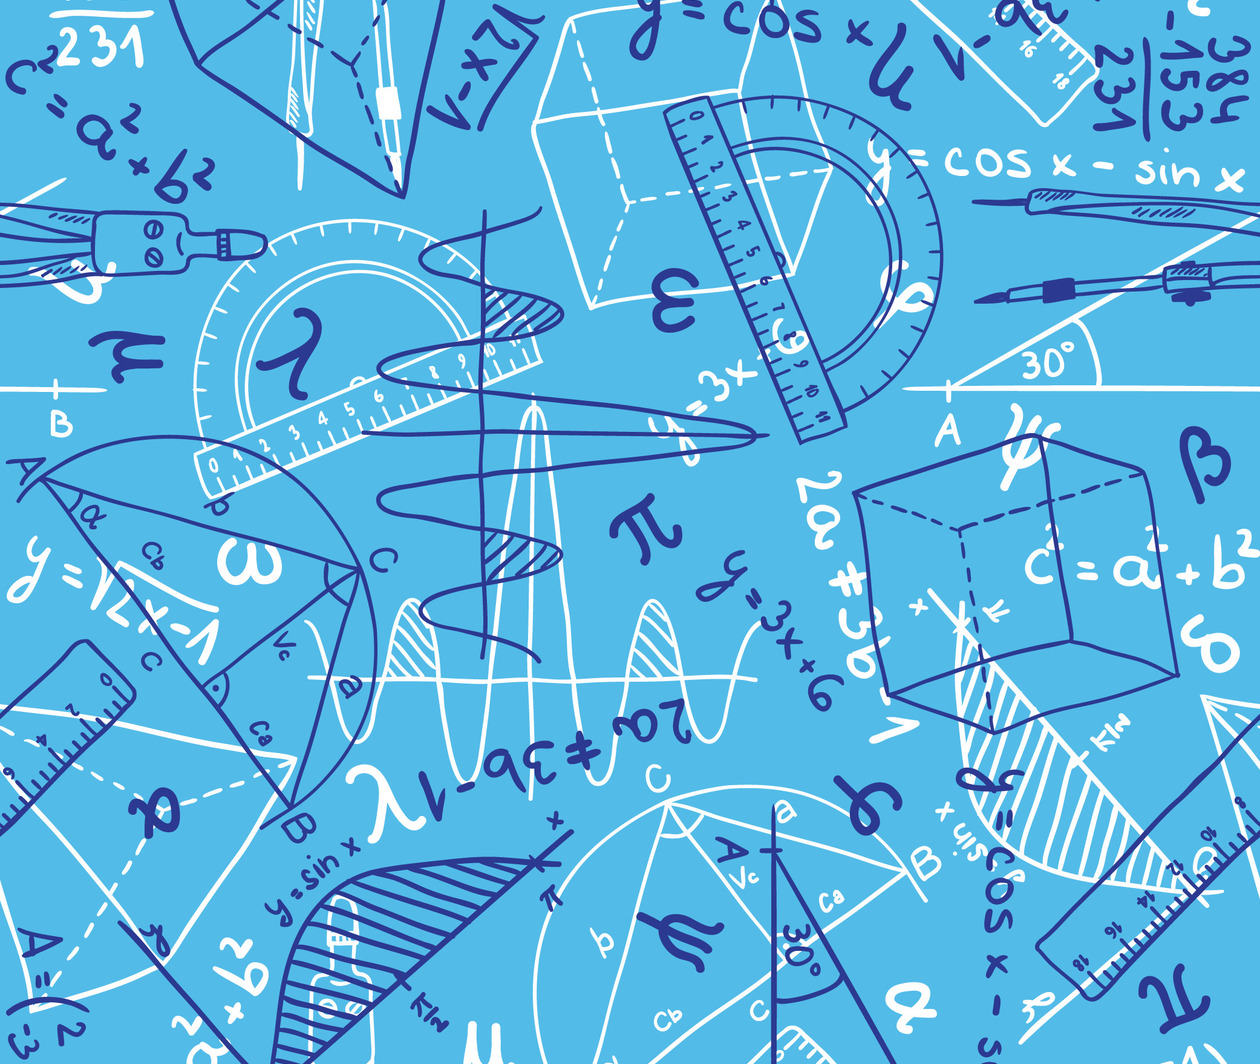 Advanced Precalculus: Geometry, Trigonometry and Exponentials